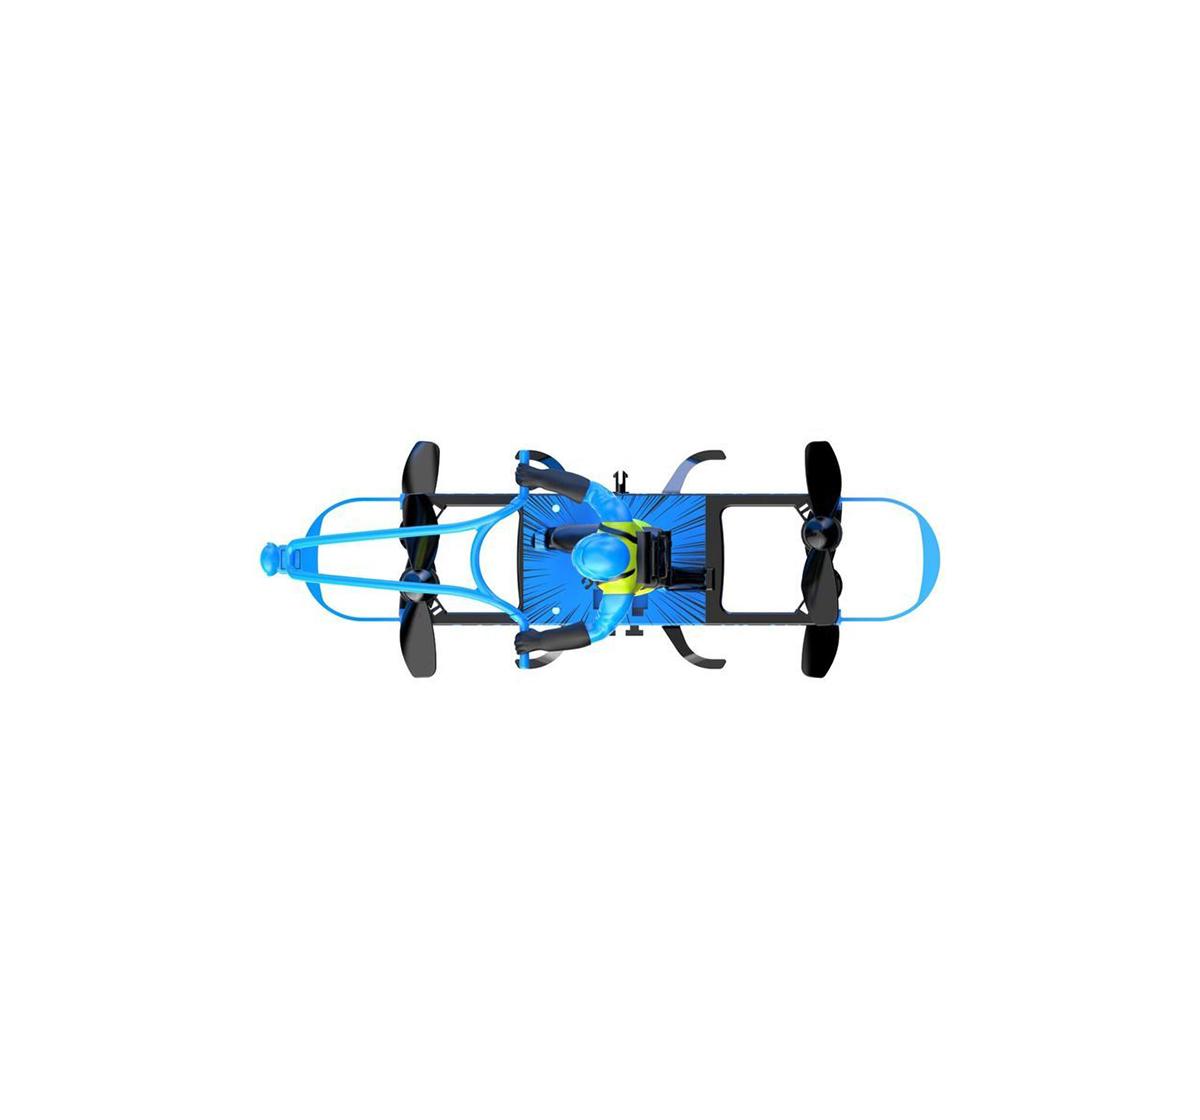 Sirius Toys | Sirius Toys Udirc U64 Multi Flying Drone Remote Control Toys for Kids age 14Y+